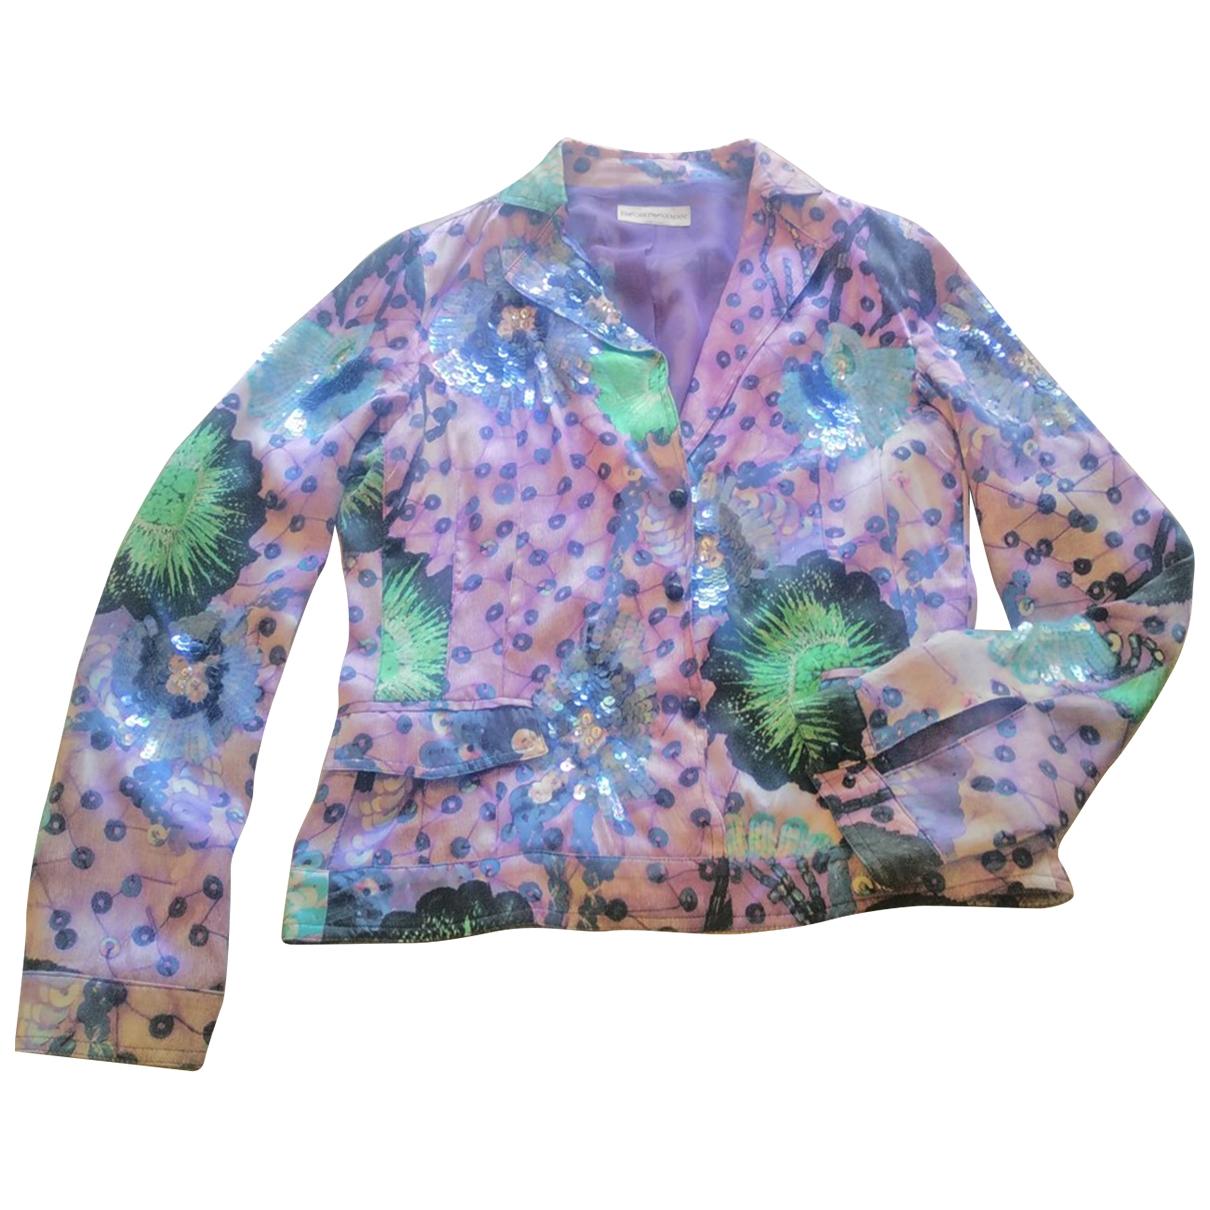 Emporio Armani \N Silk jacket for Women 42 IT